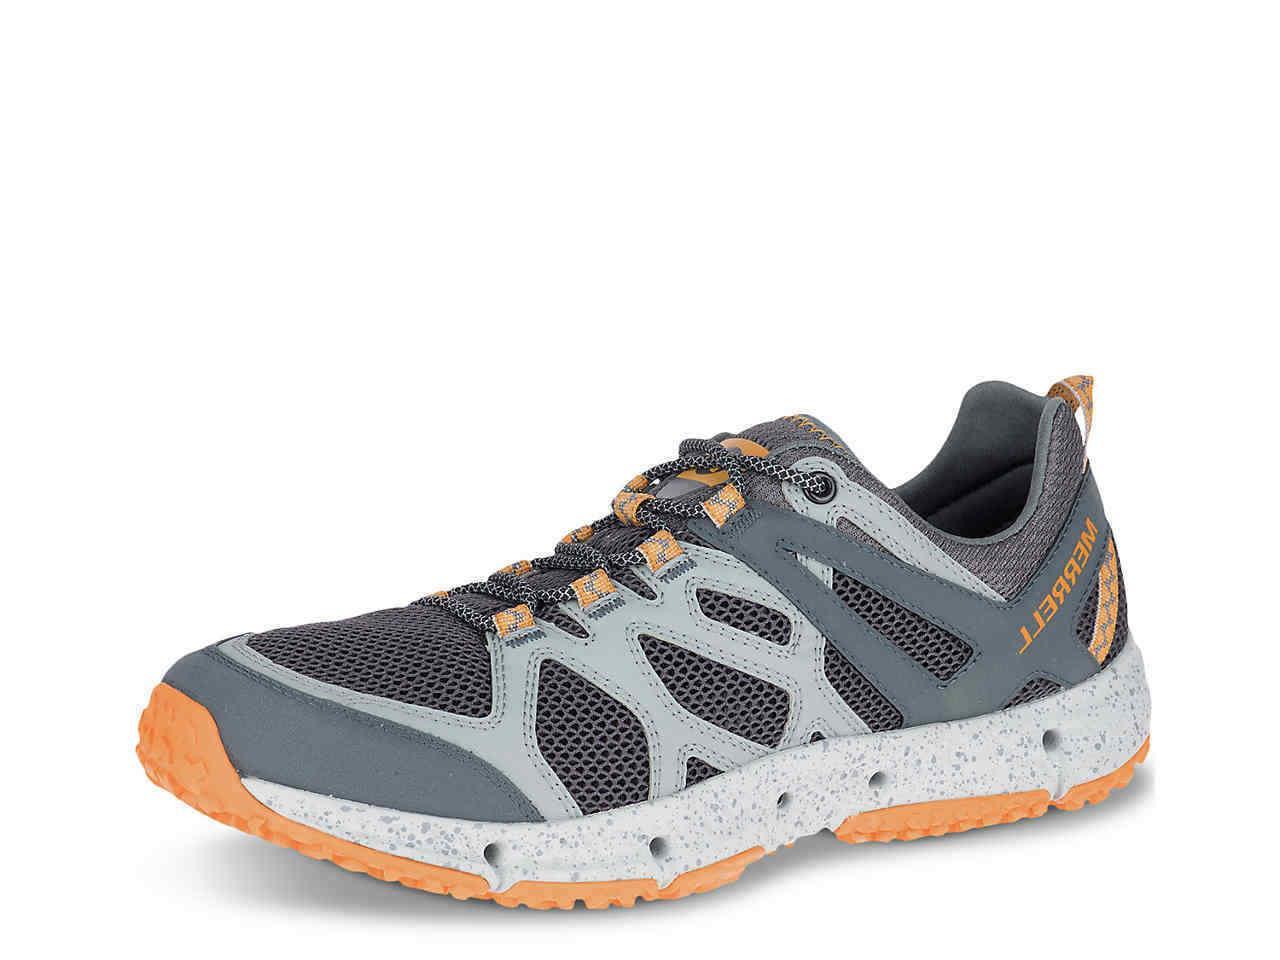 new hydrotrekker gray orange hiking water shoes